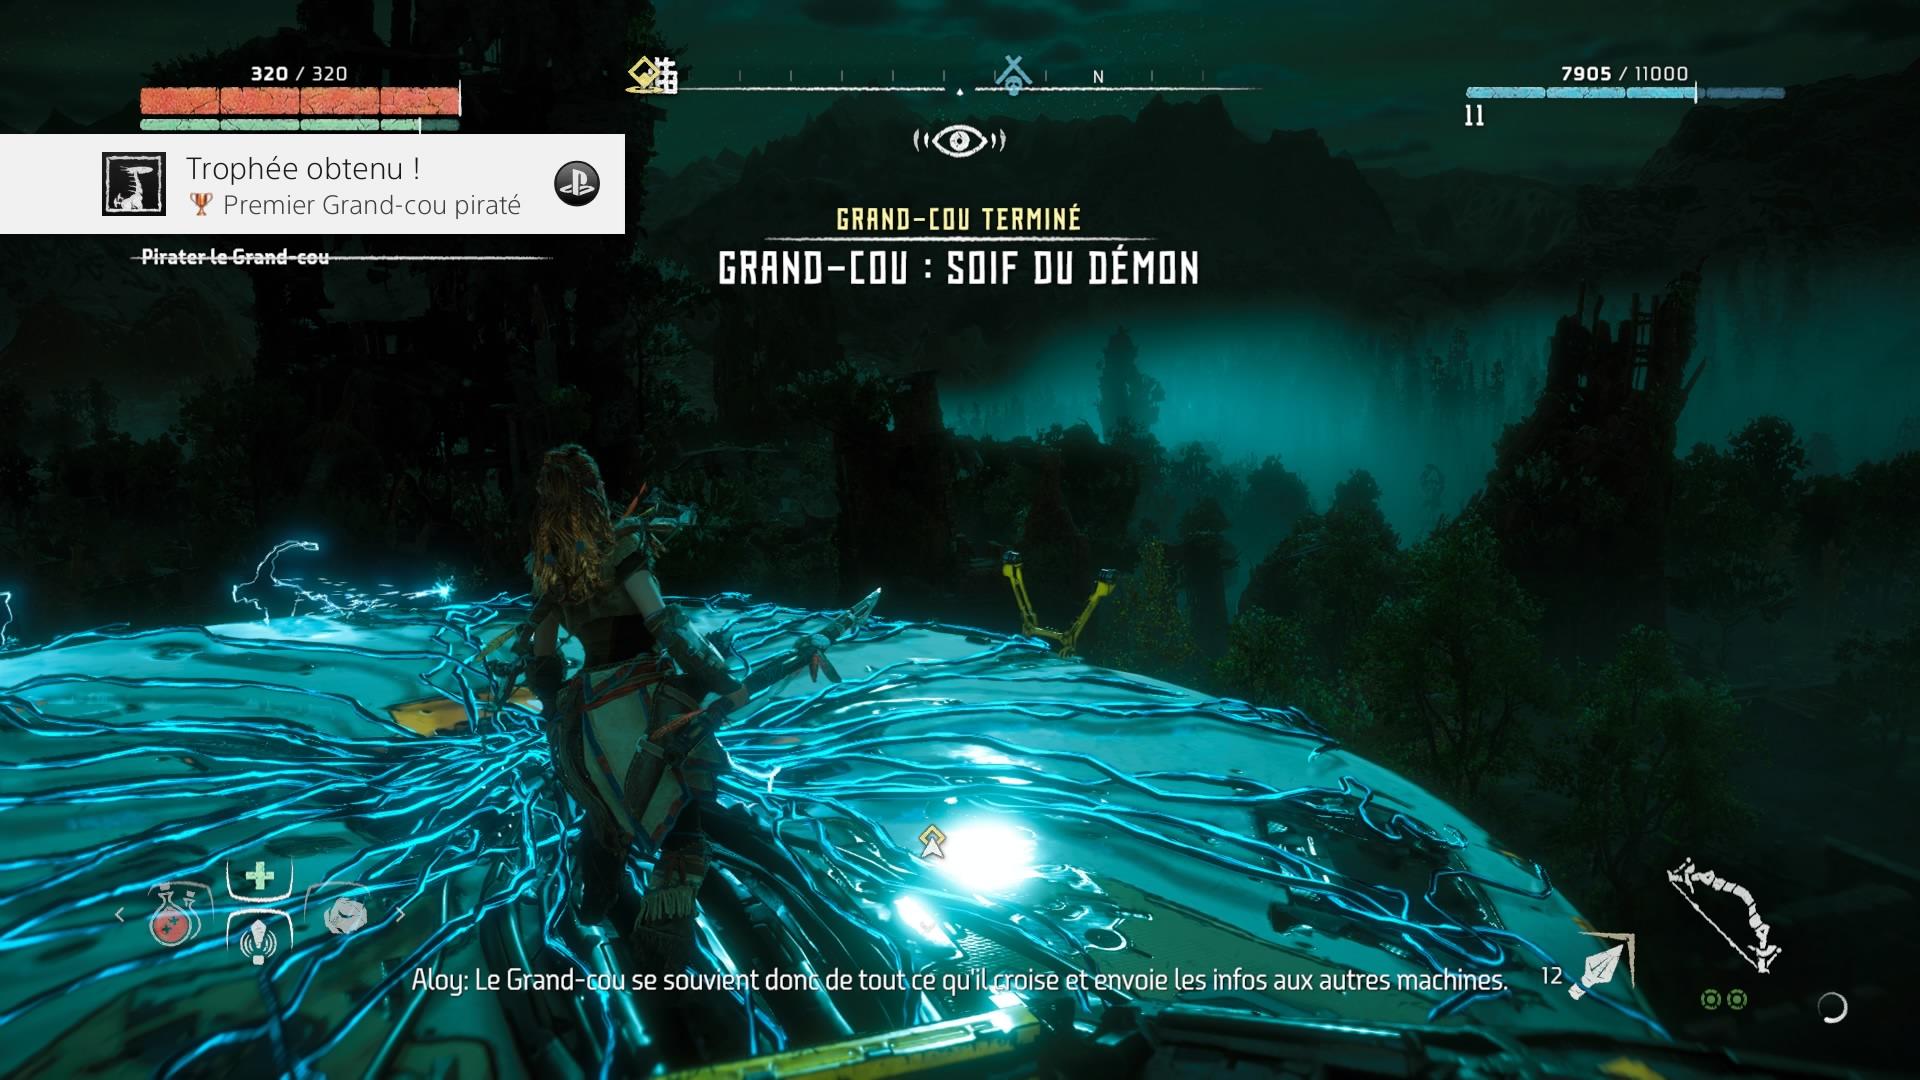 Horizon Zero Dawn premier grand-cou piraté